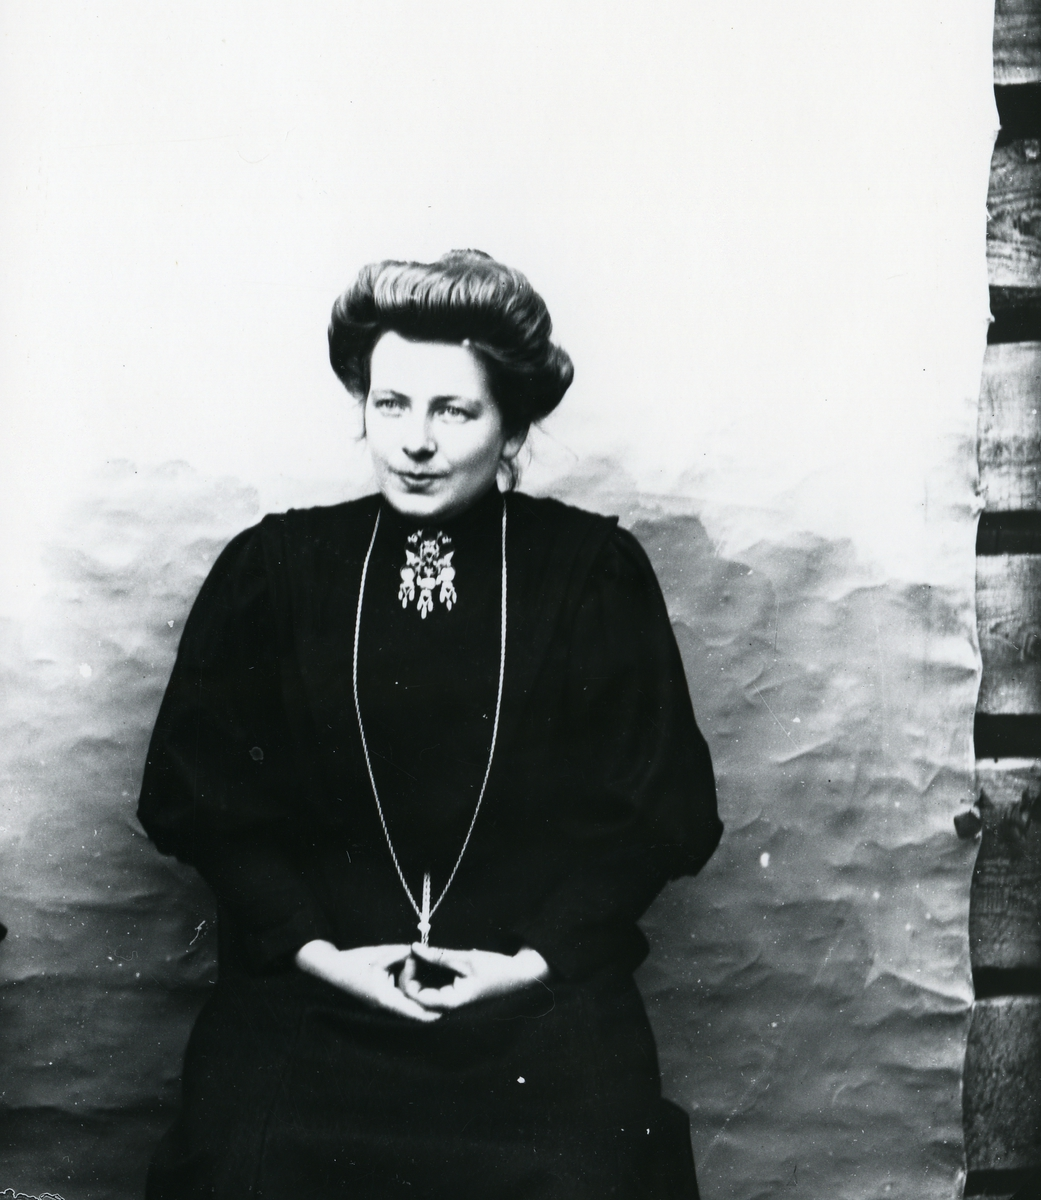 Mørkkledd kvinne i halvfigur, sittende foran lerret